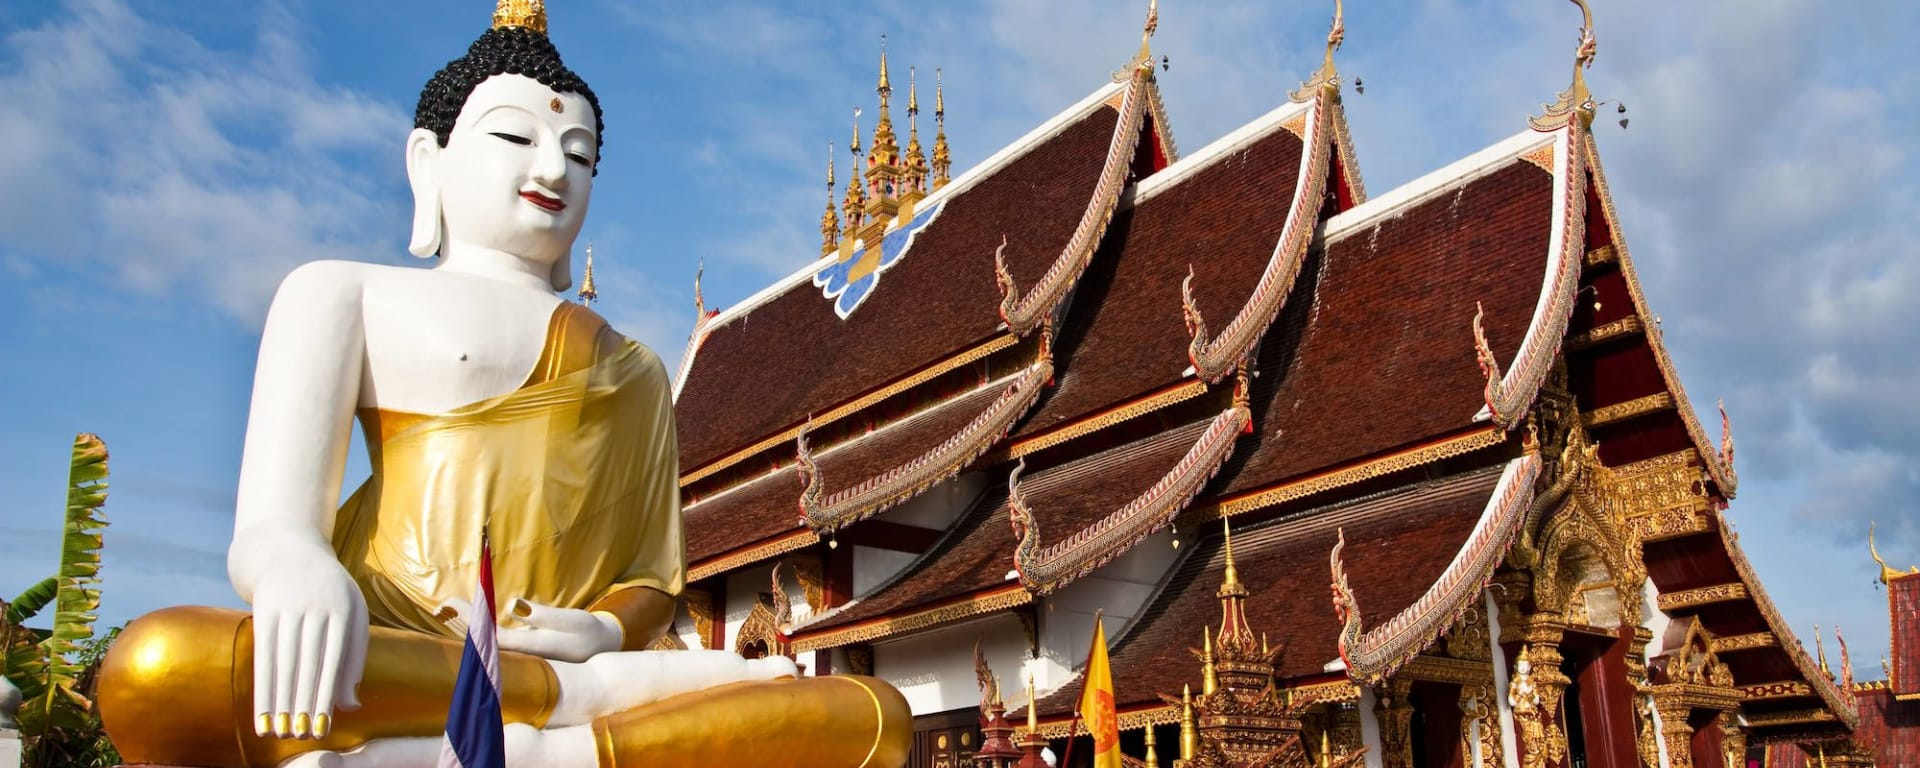 Chiang Mai City mit Doi Suthep: Chiang Mai Temple